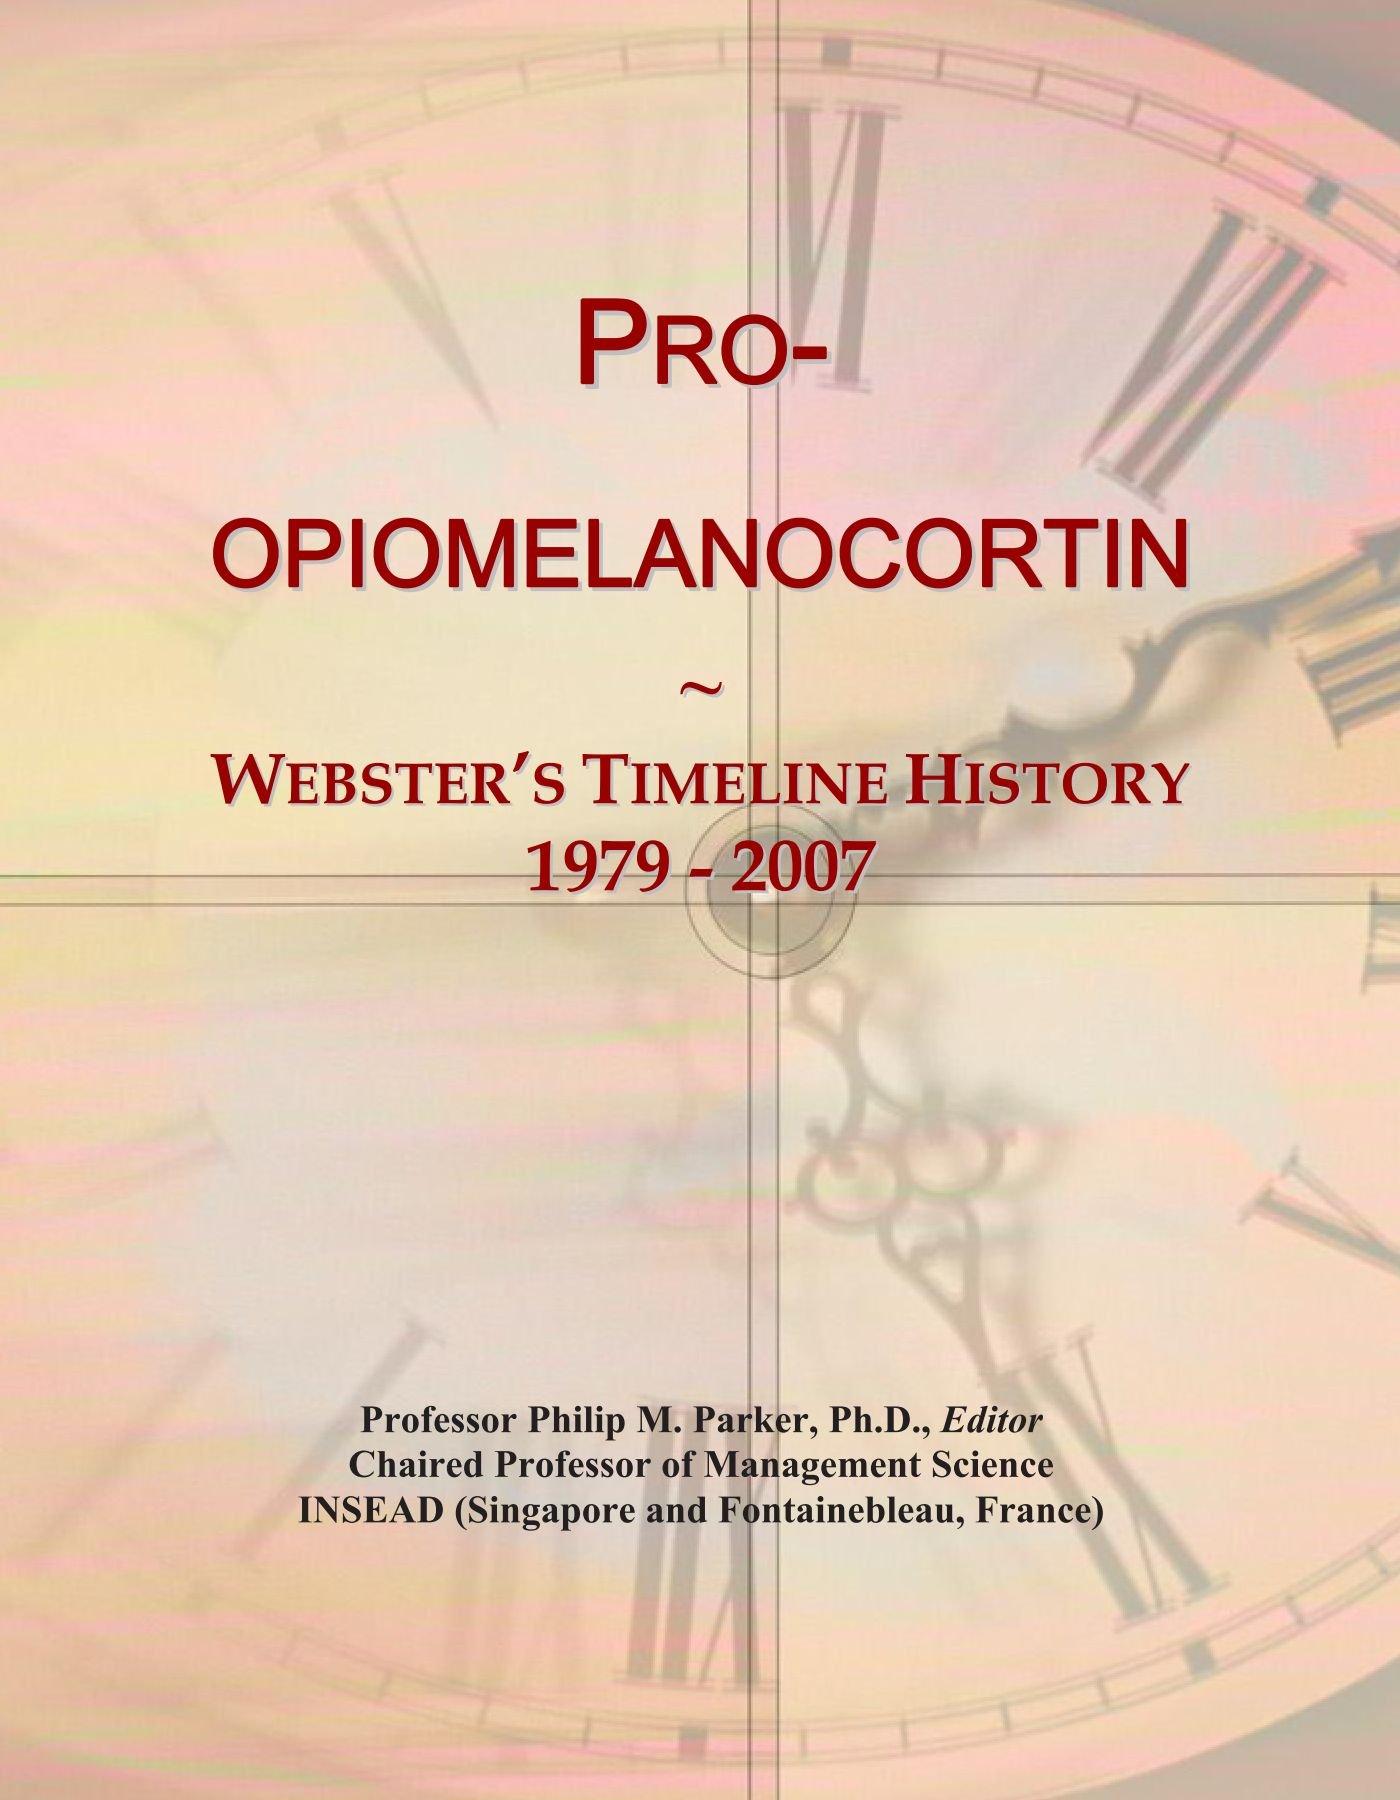 Pro-opiomelanocortin: Webster's Timeline History, 1979 - 2007 pdf